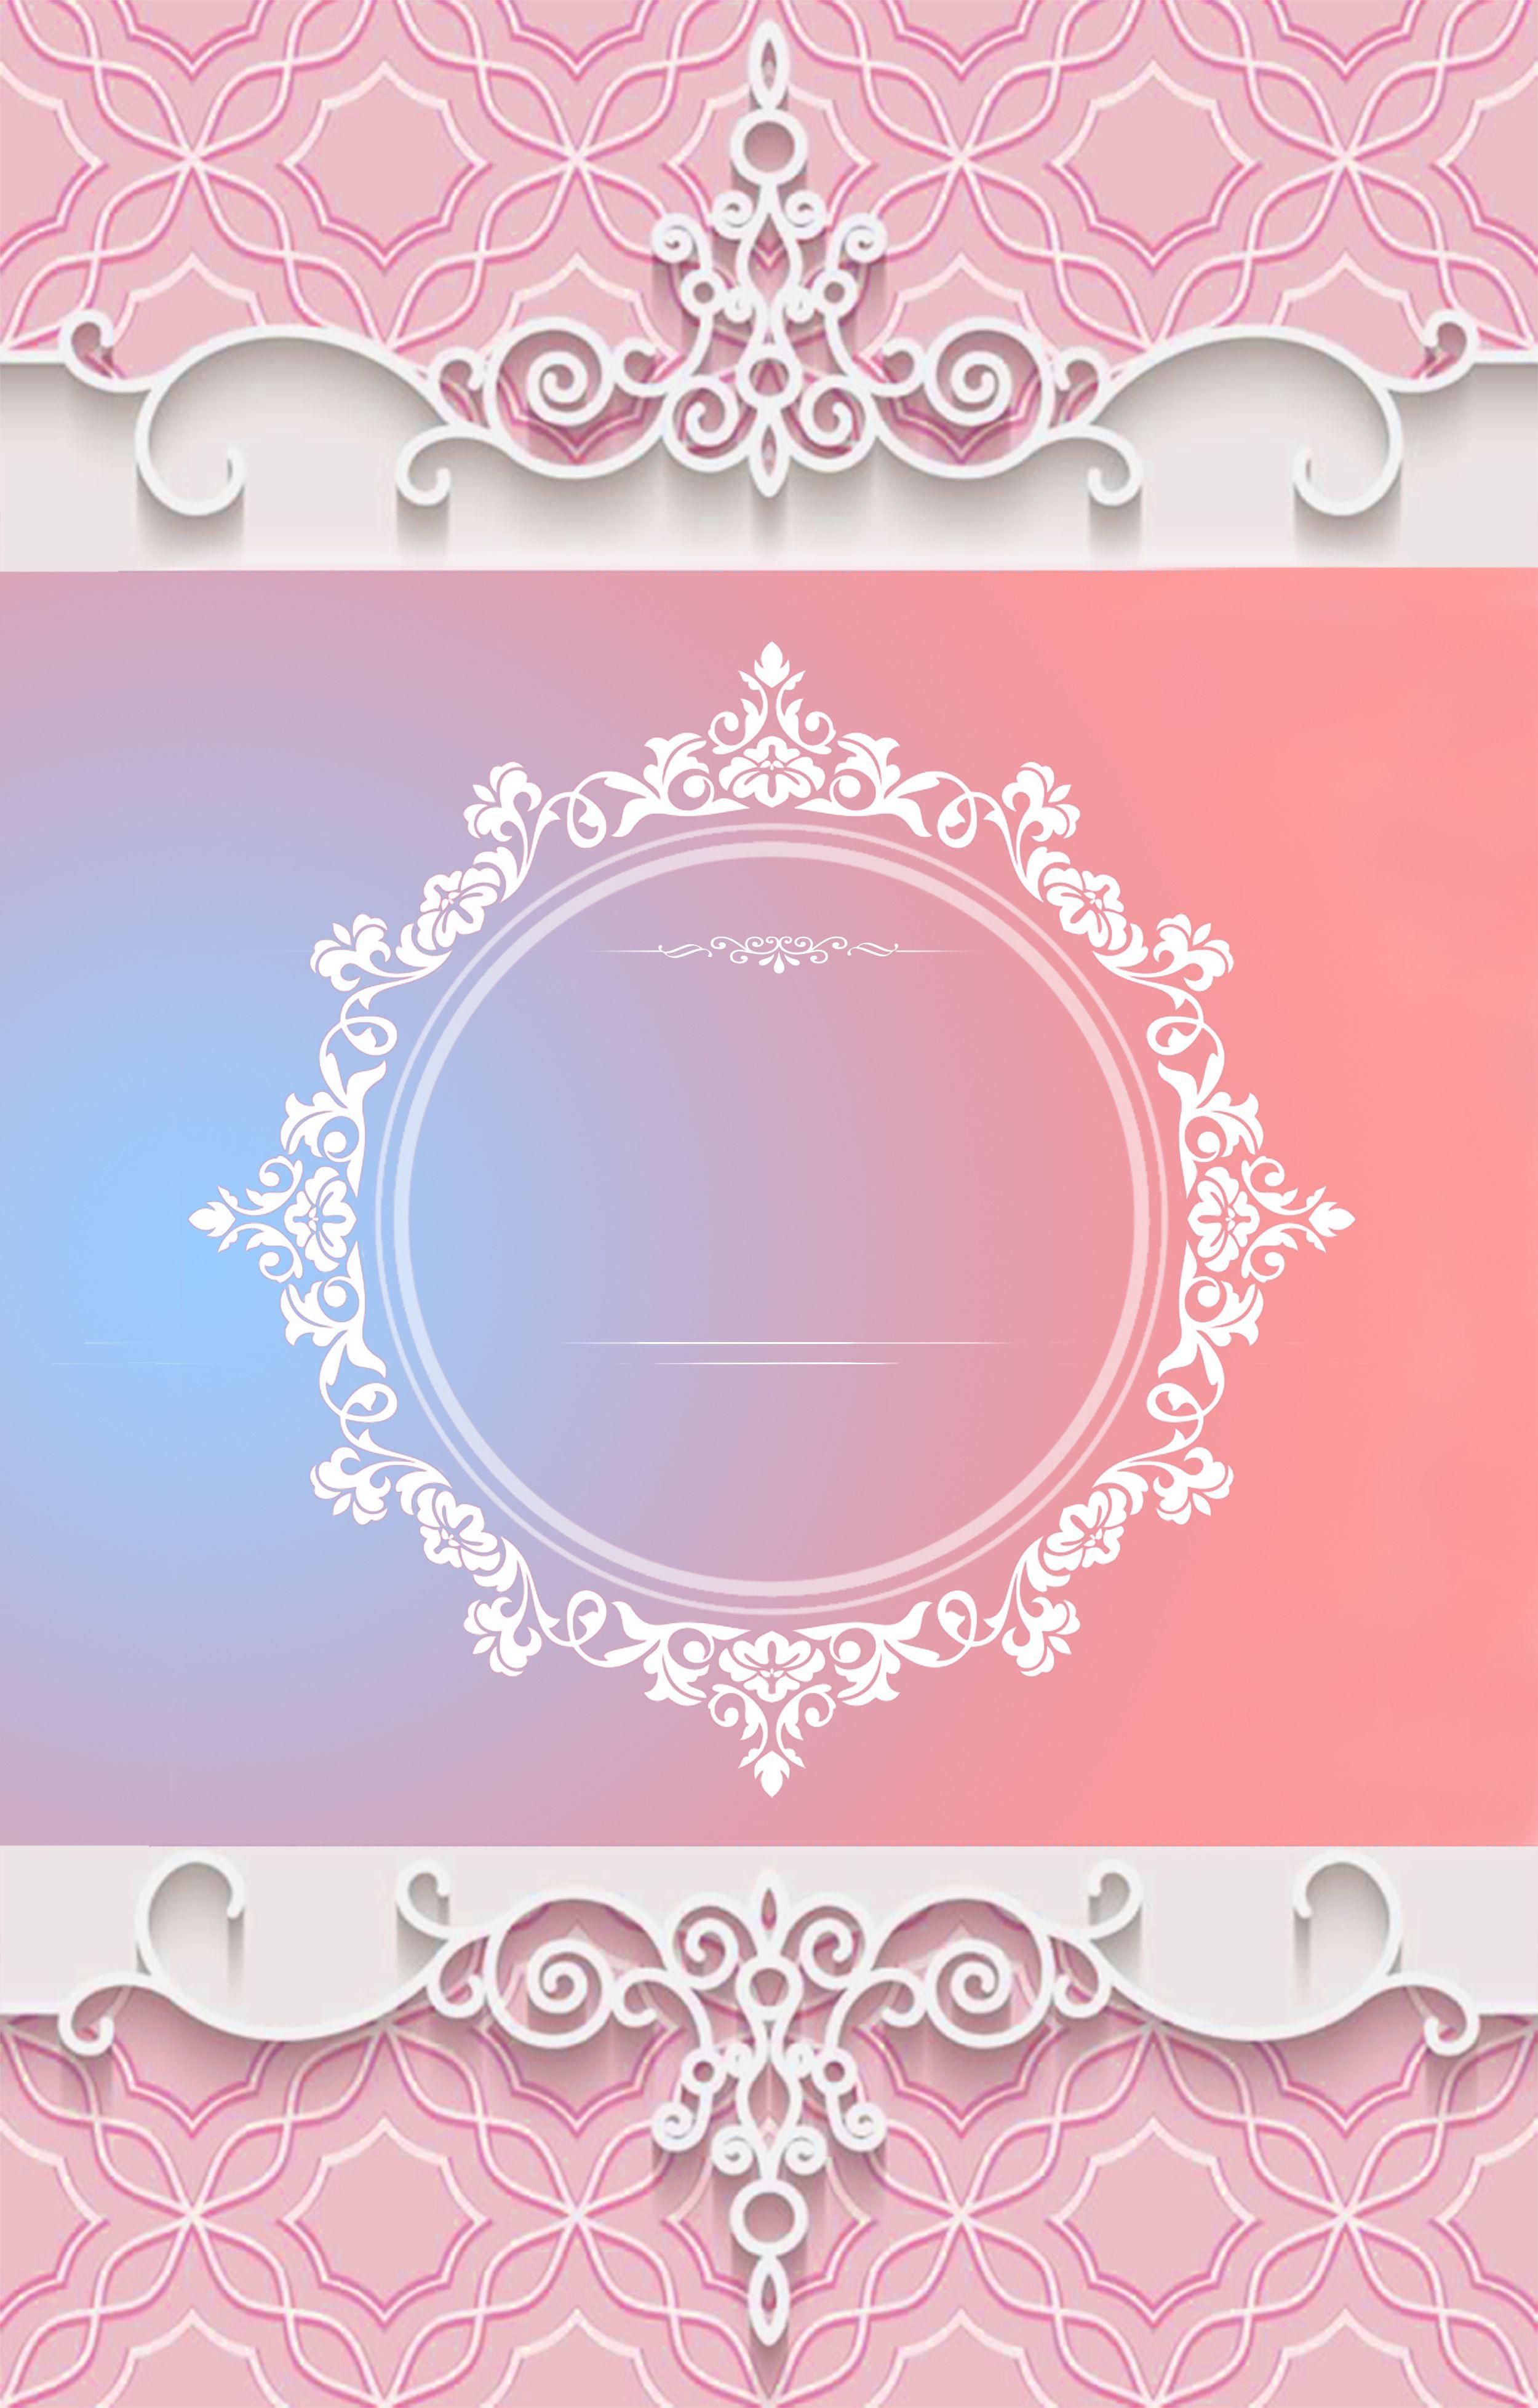 Pink Wedding Welcome Poster Signboard Background Kartu Pernikahan Kartu Contoh Undangan Pernikahan